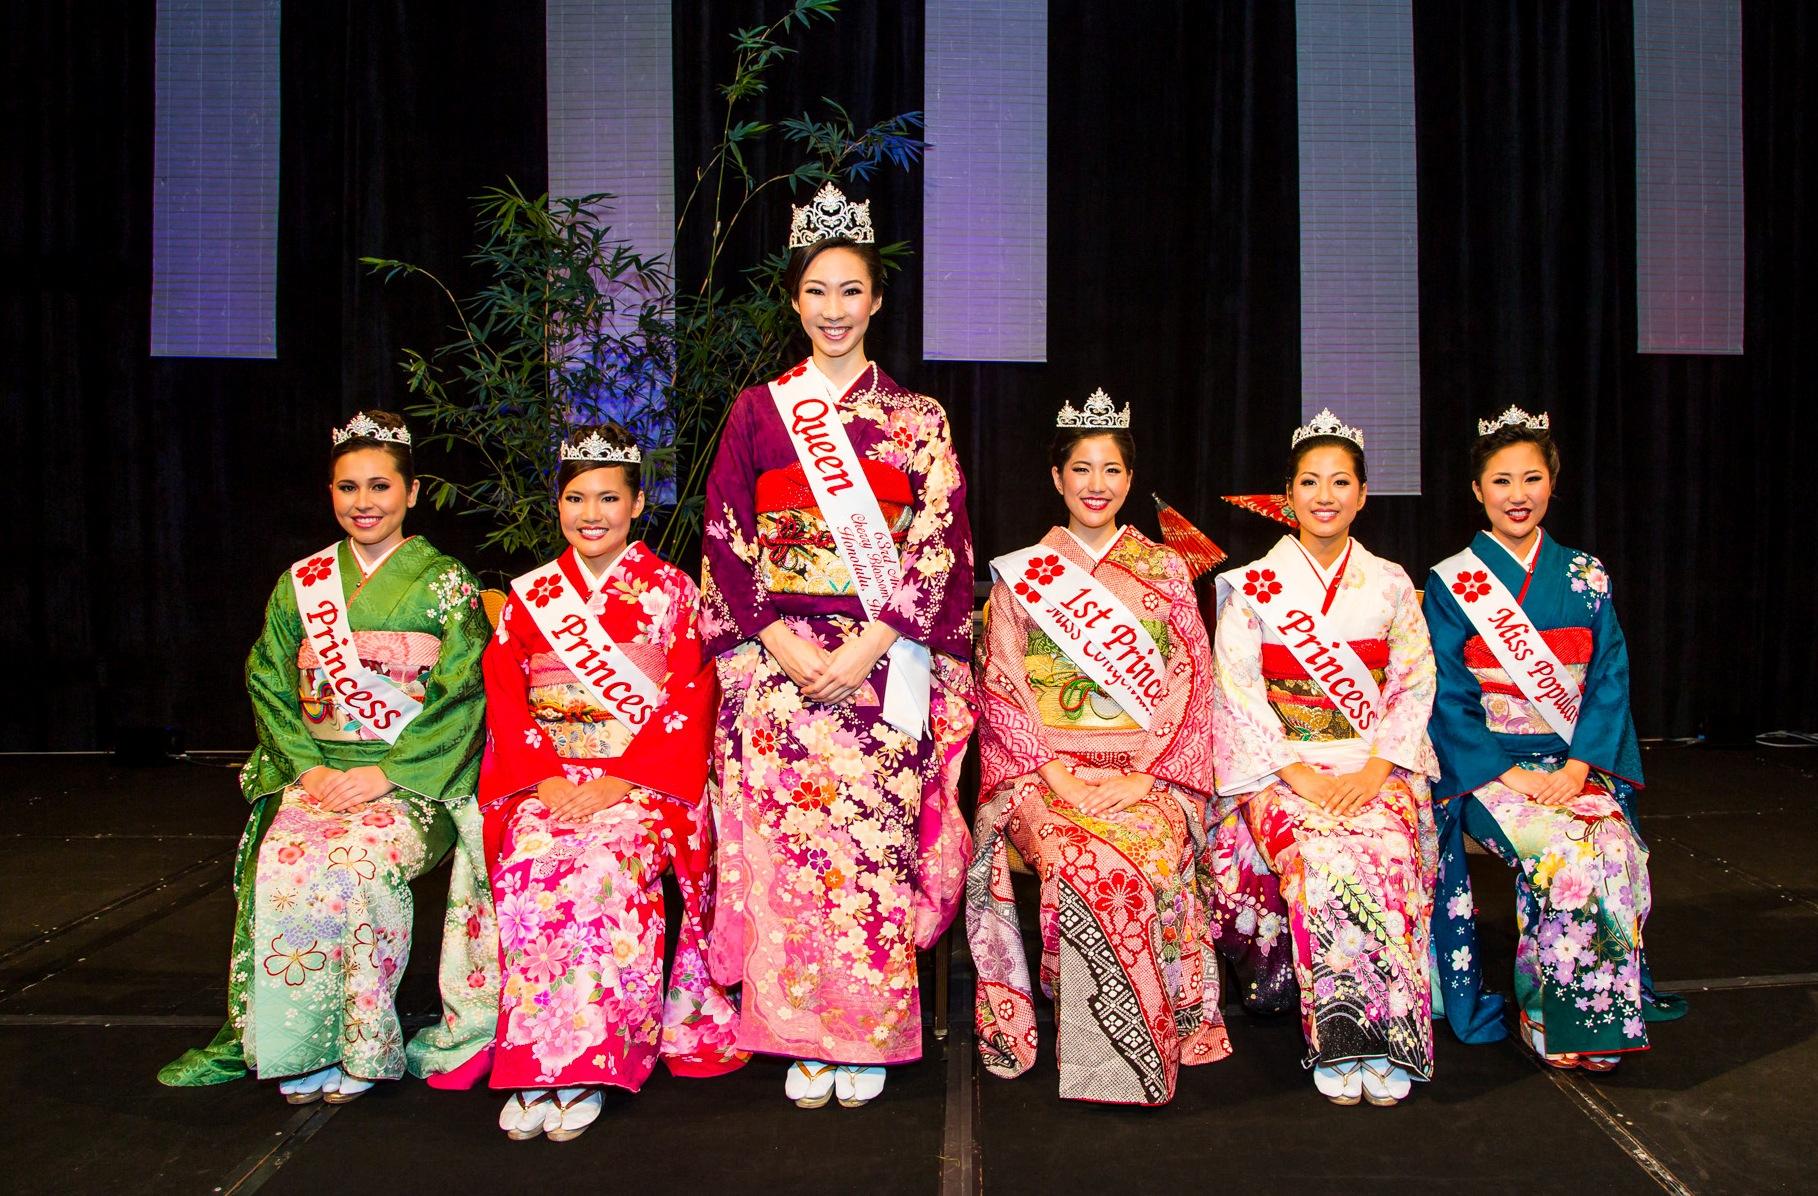 Left to right: Princess Jessica Kaneshiro, Princess Kyla Teramoto, Queen Kimberly Takata, First Princess and Miss Congeniality Rosalei Chinen, Princess Celina Quach, and Miss Popularity Heather Miura.